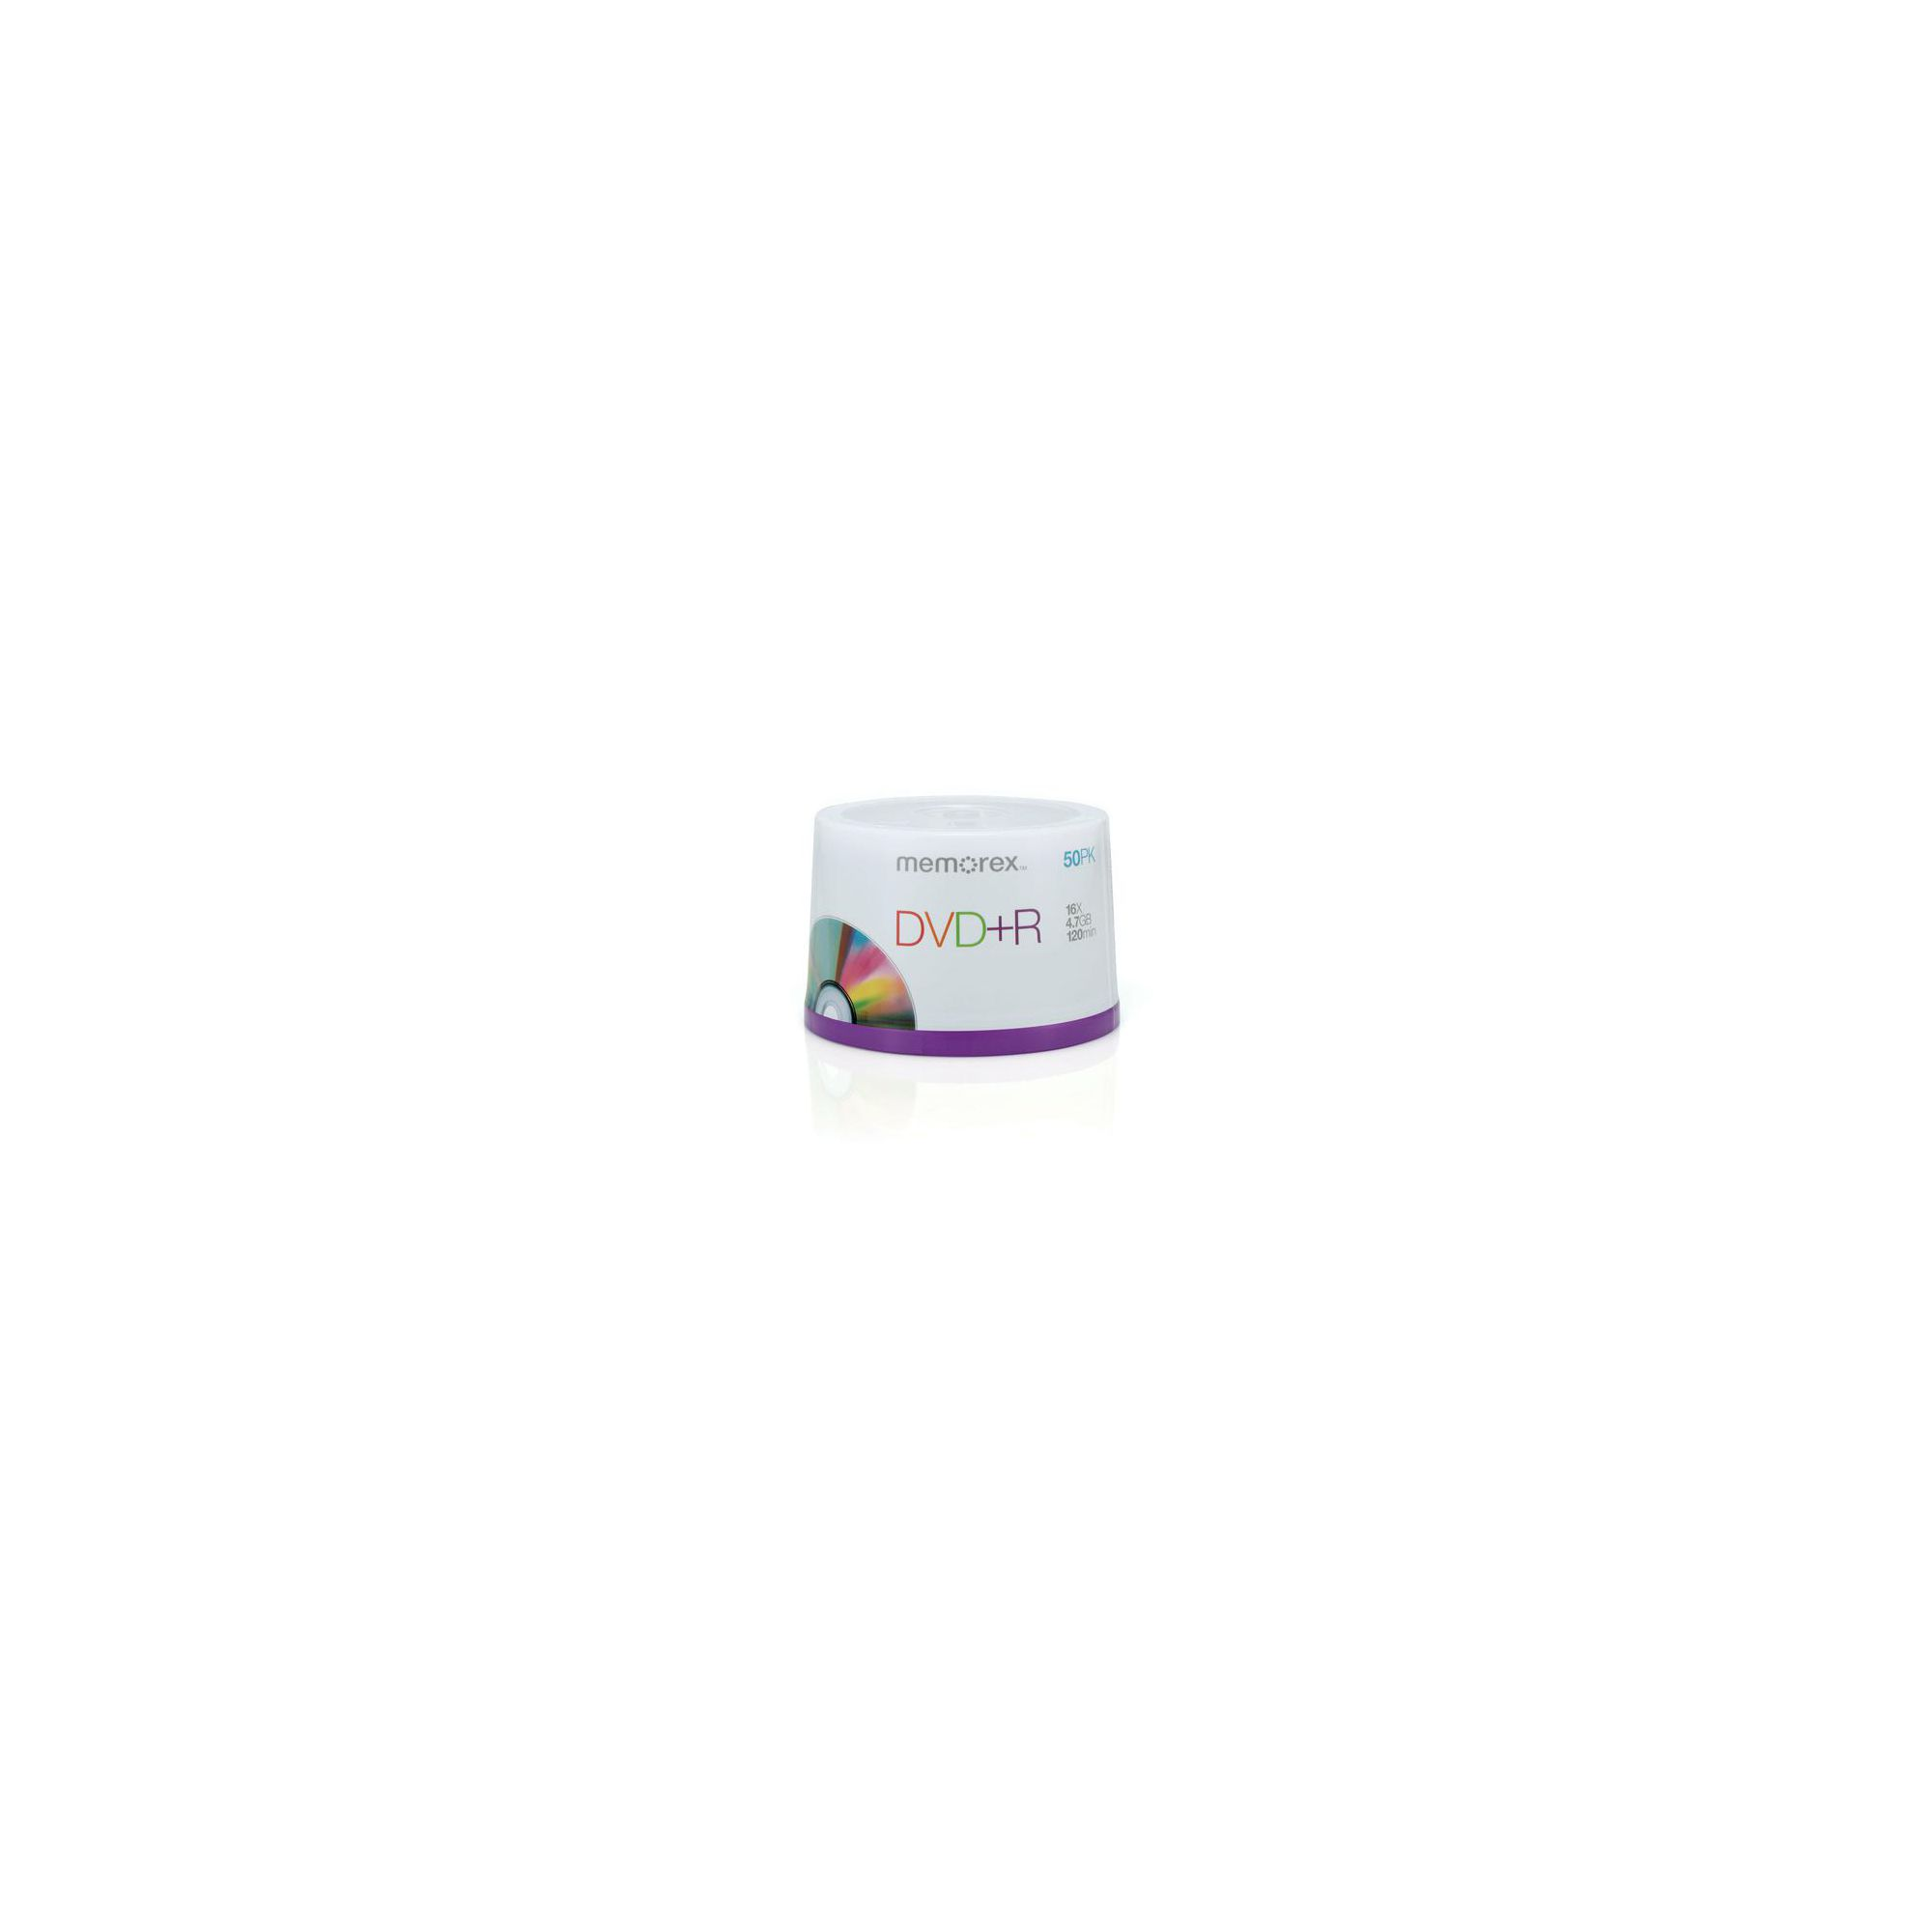 memorex-products-16x-dvdr-0-47gb-50-pack